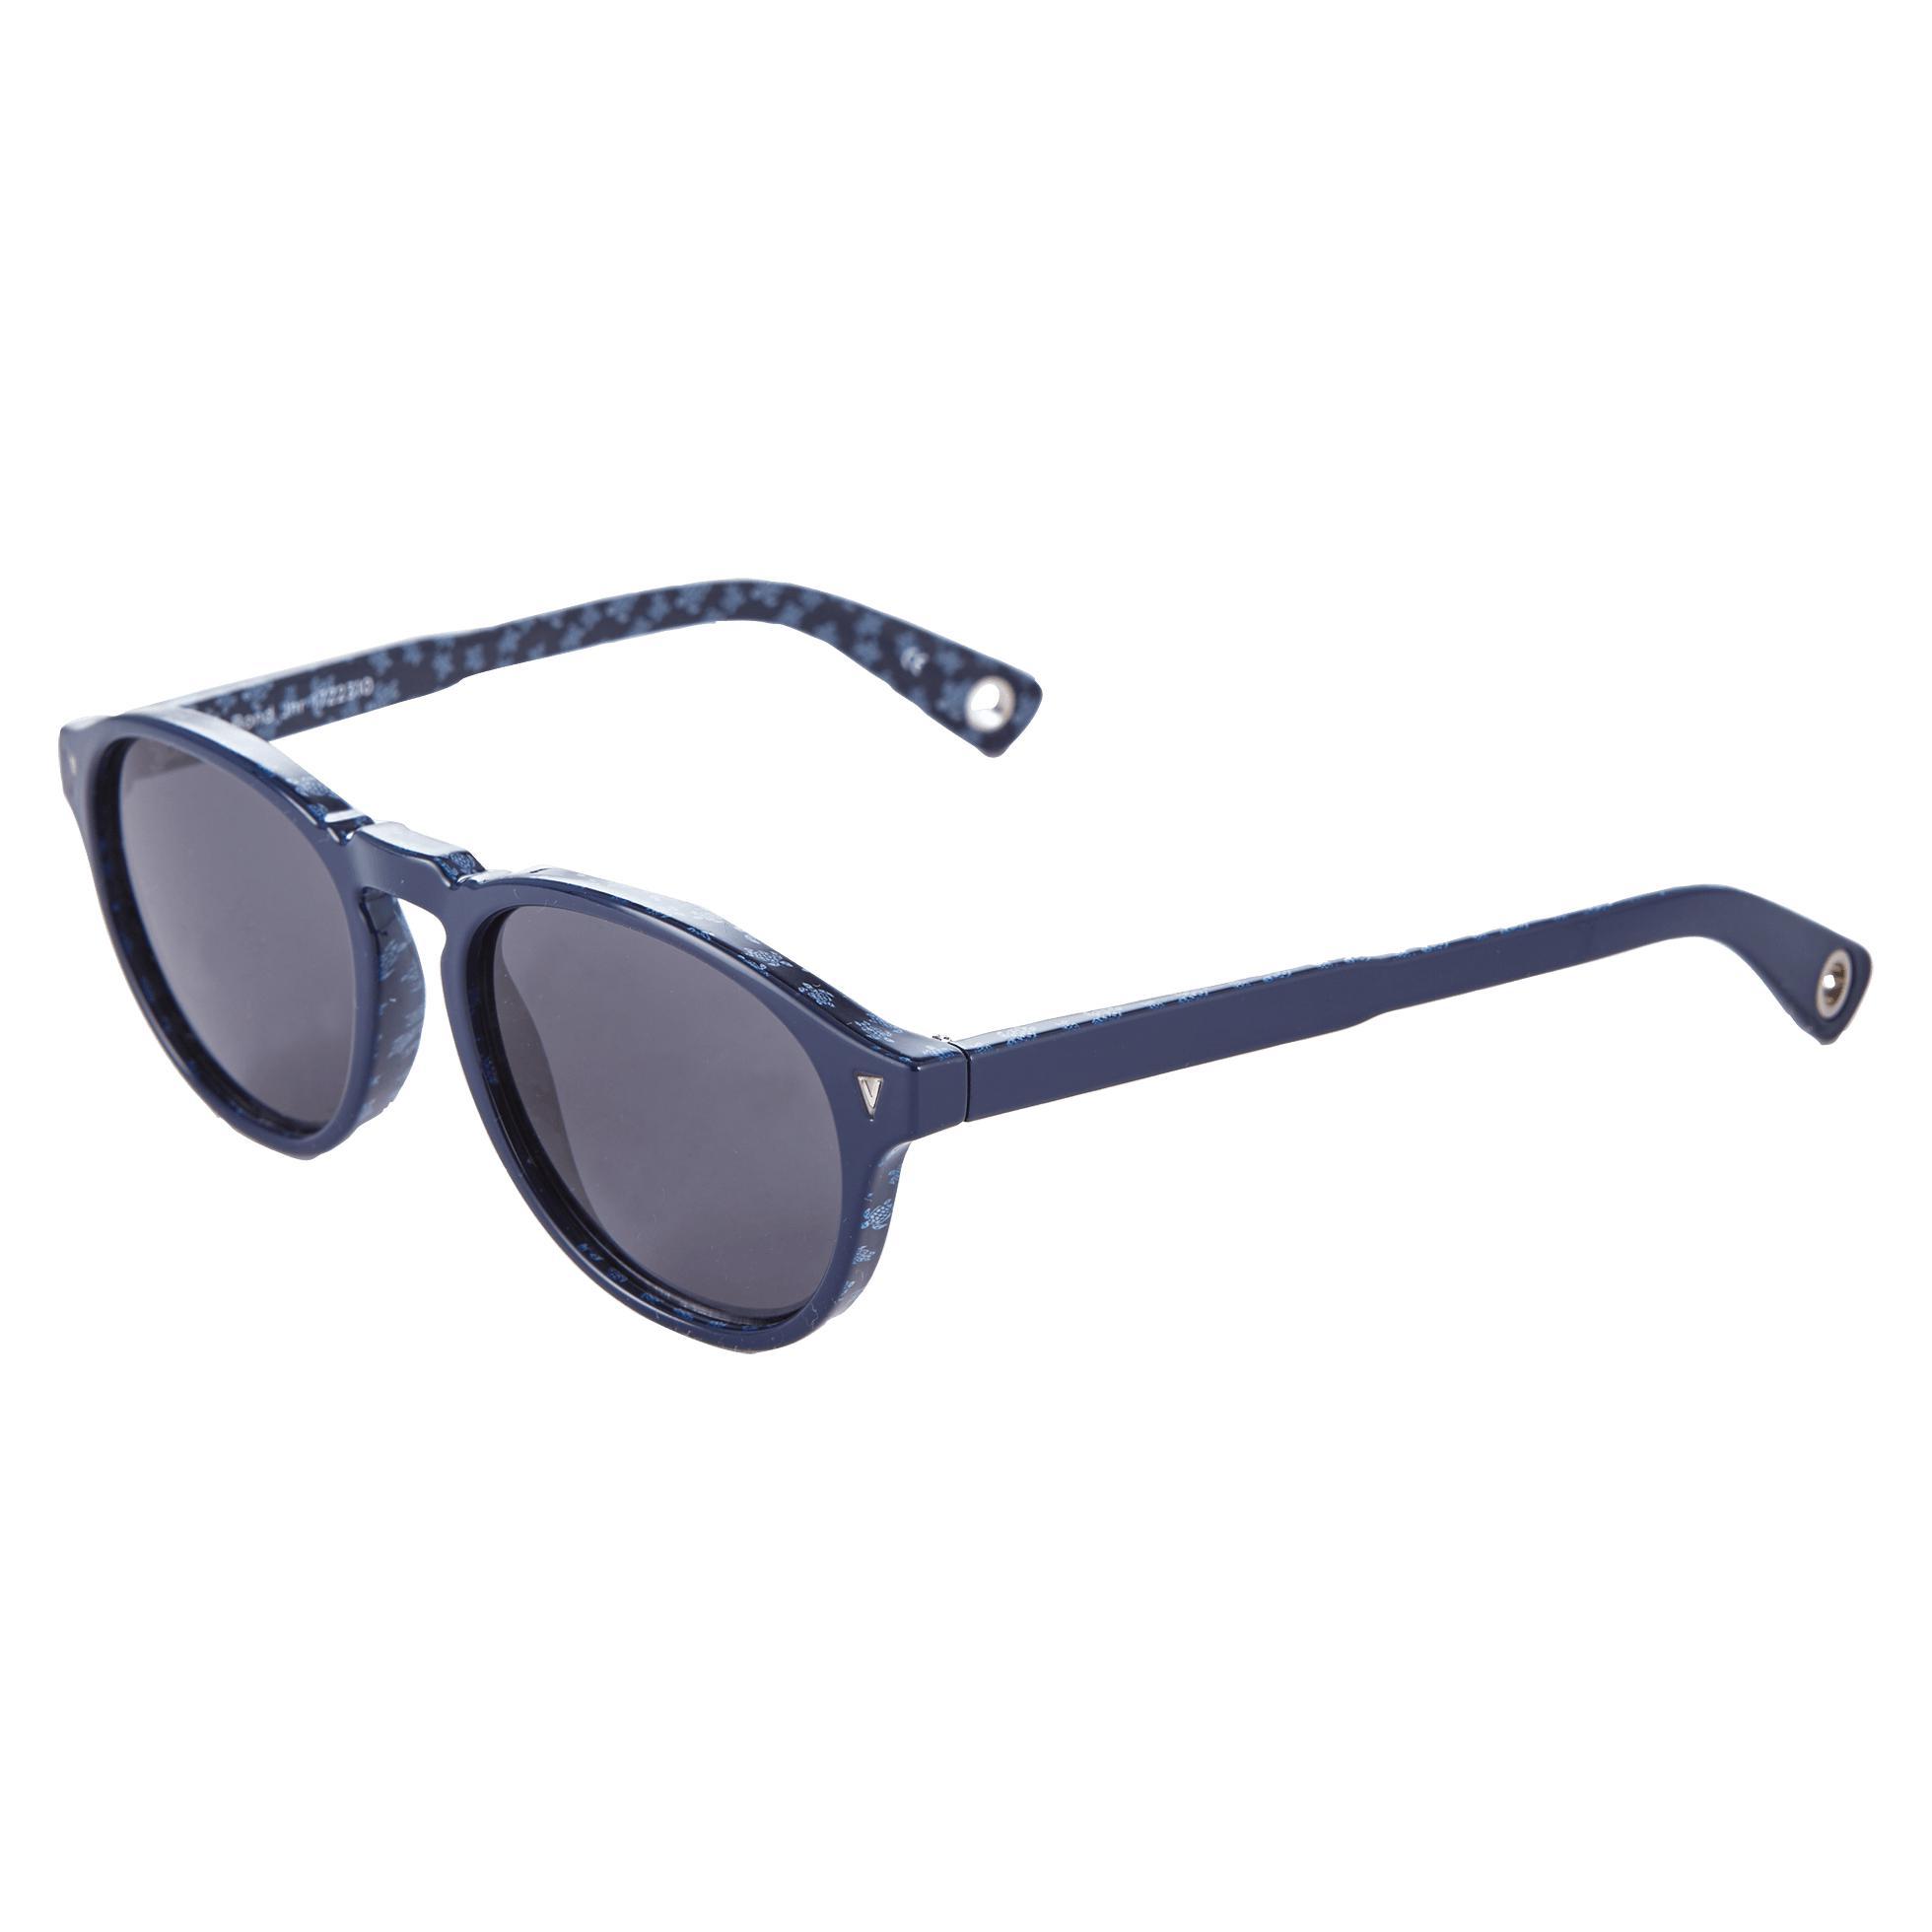 Vilebrequin Turtles Acetate Sunglasses, Zeiss Lenses in Navy (Blue)